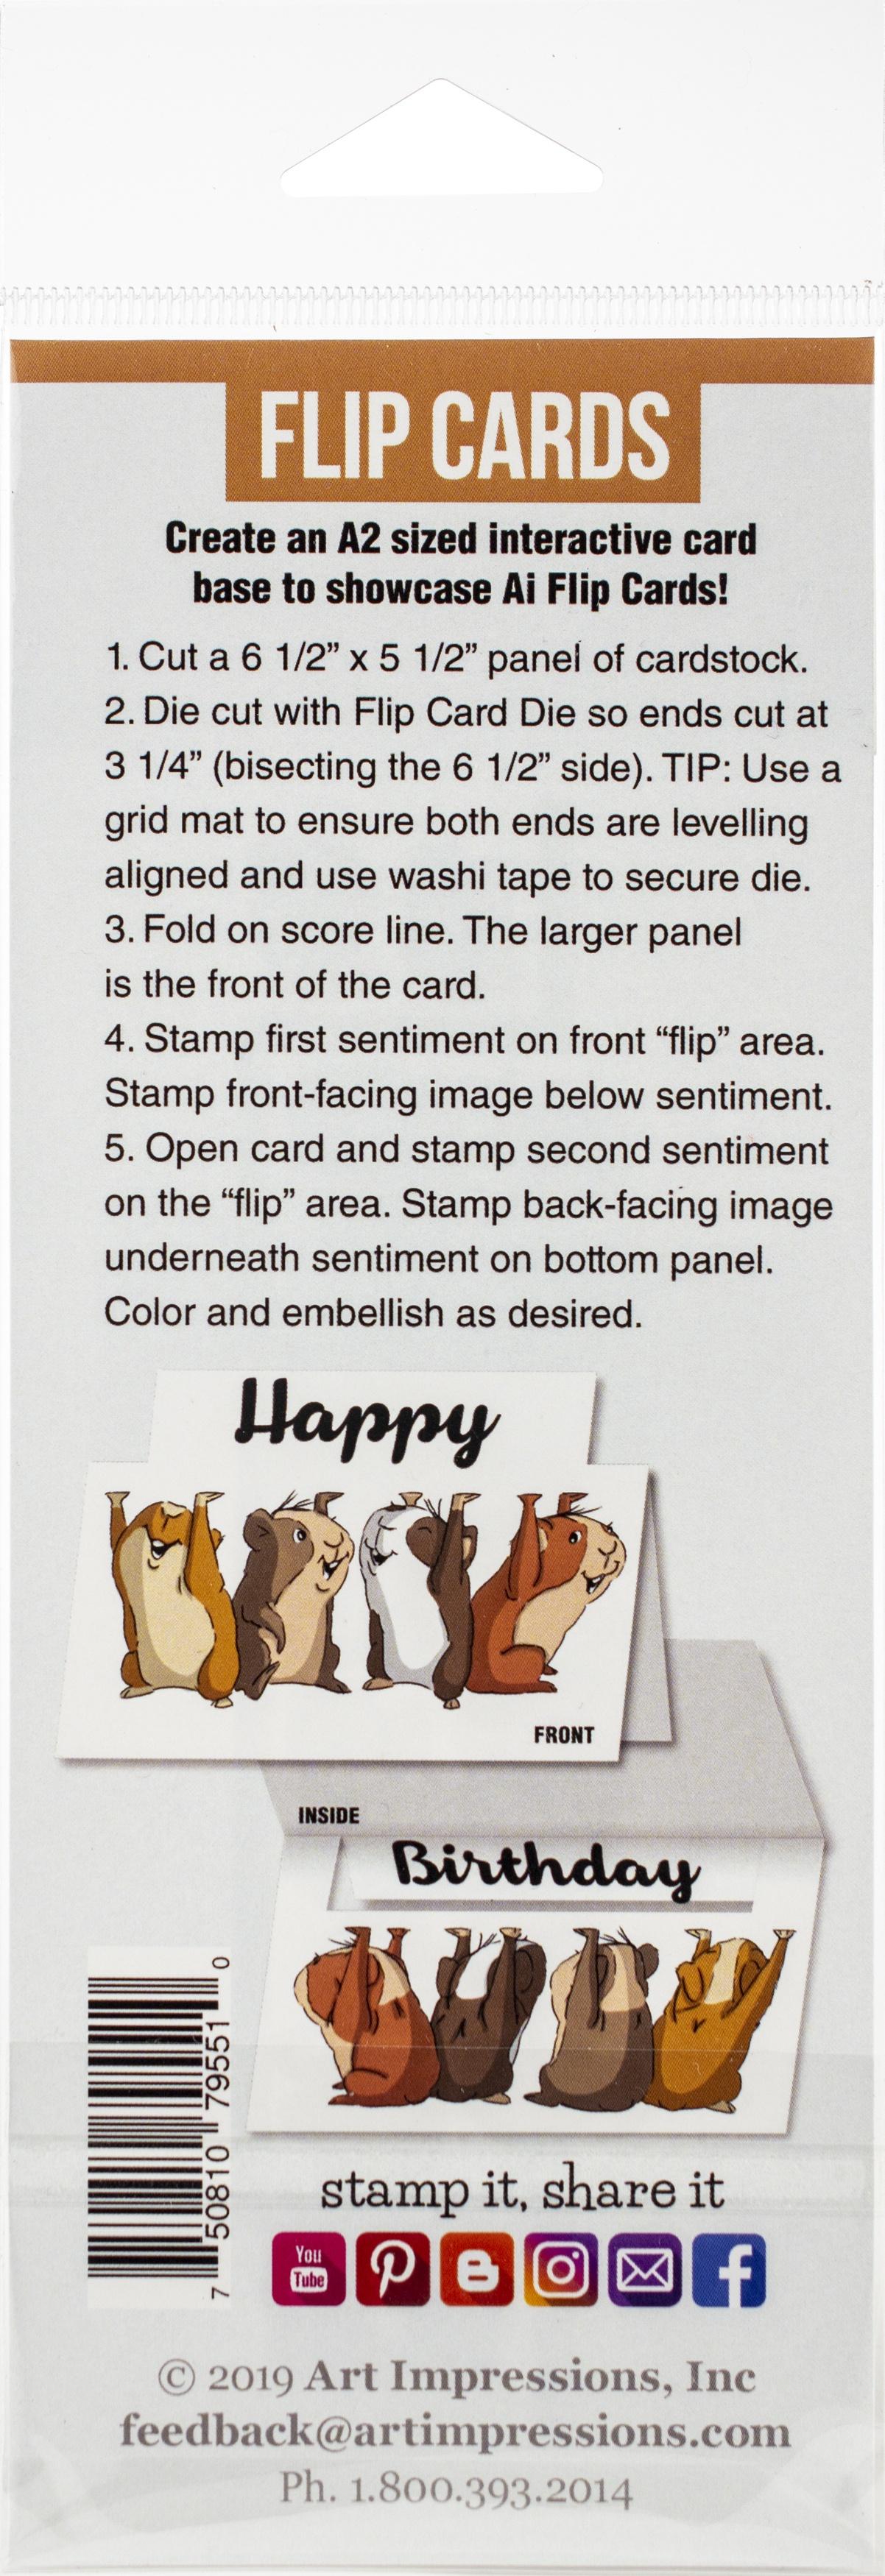 Art Impressions Flip Card Die